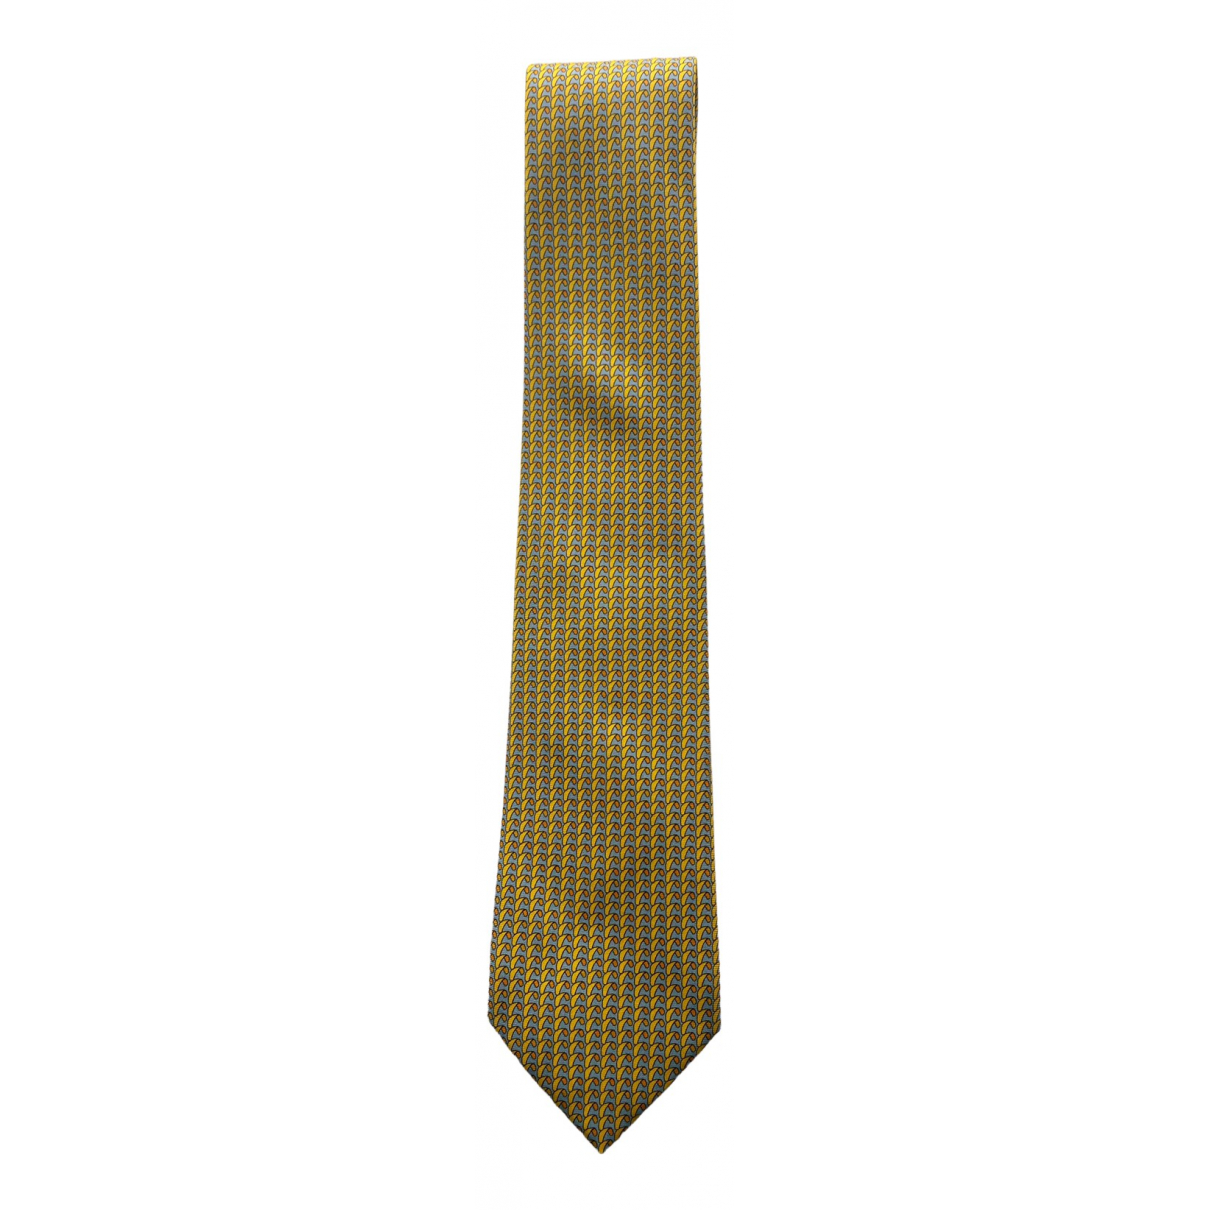 Hermes \N Krawatten in  Gelb Seide